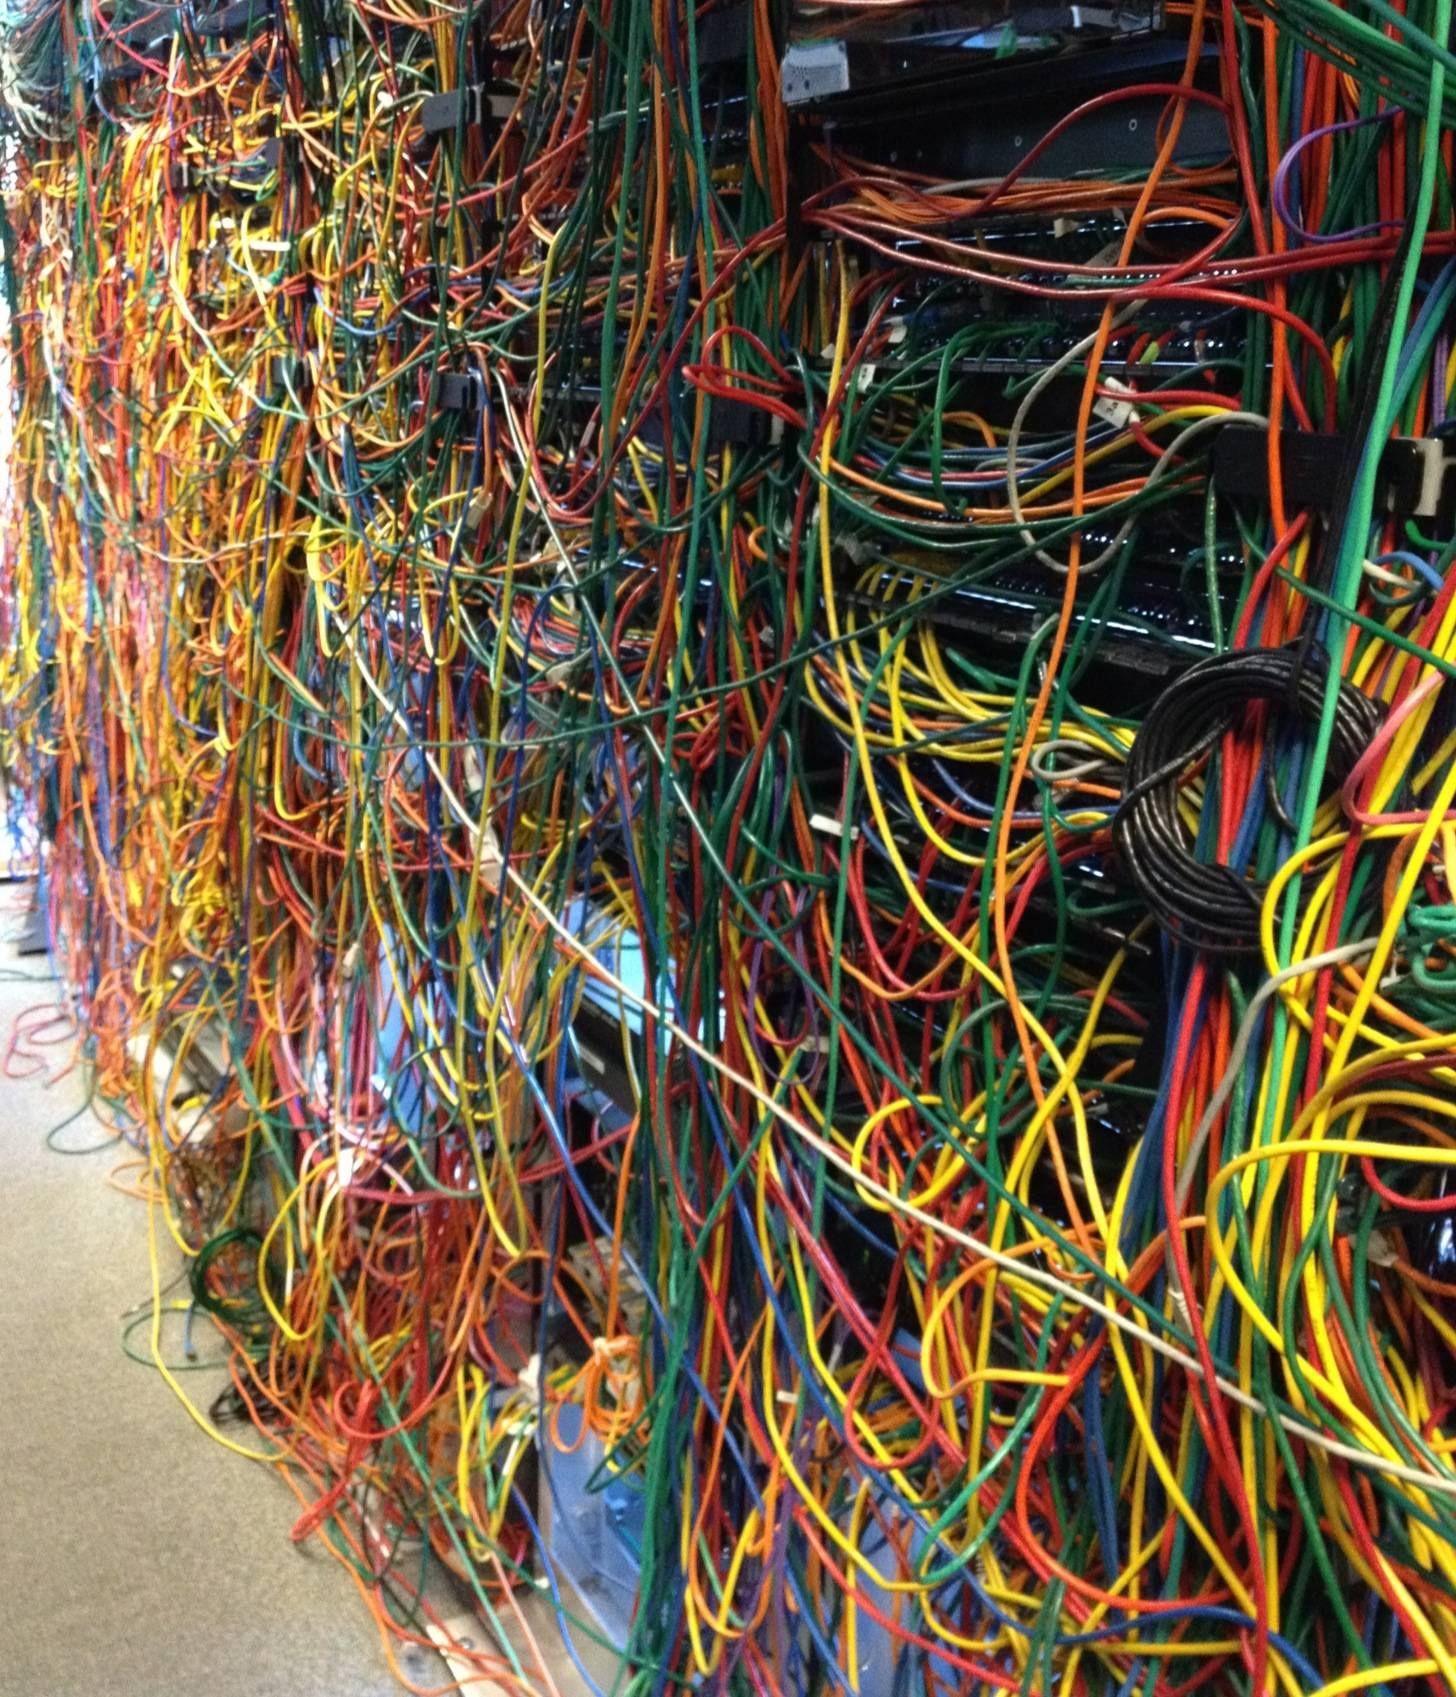 messy wiring closets wiring center u2022 rh 45 77 163 200 Network Wiring Closet Network Wiring Closet Beautiful